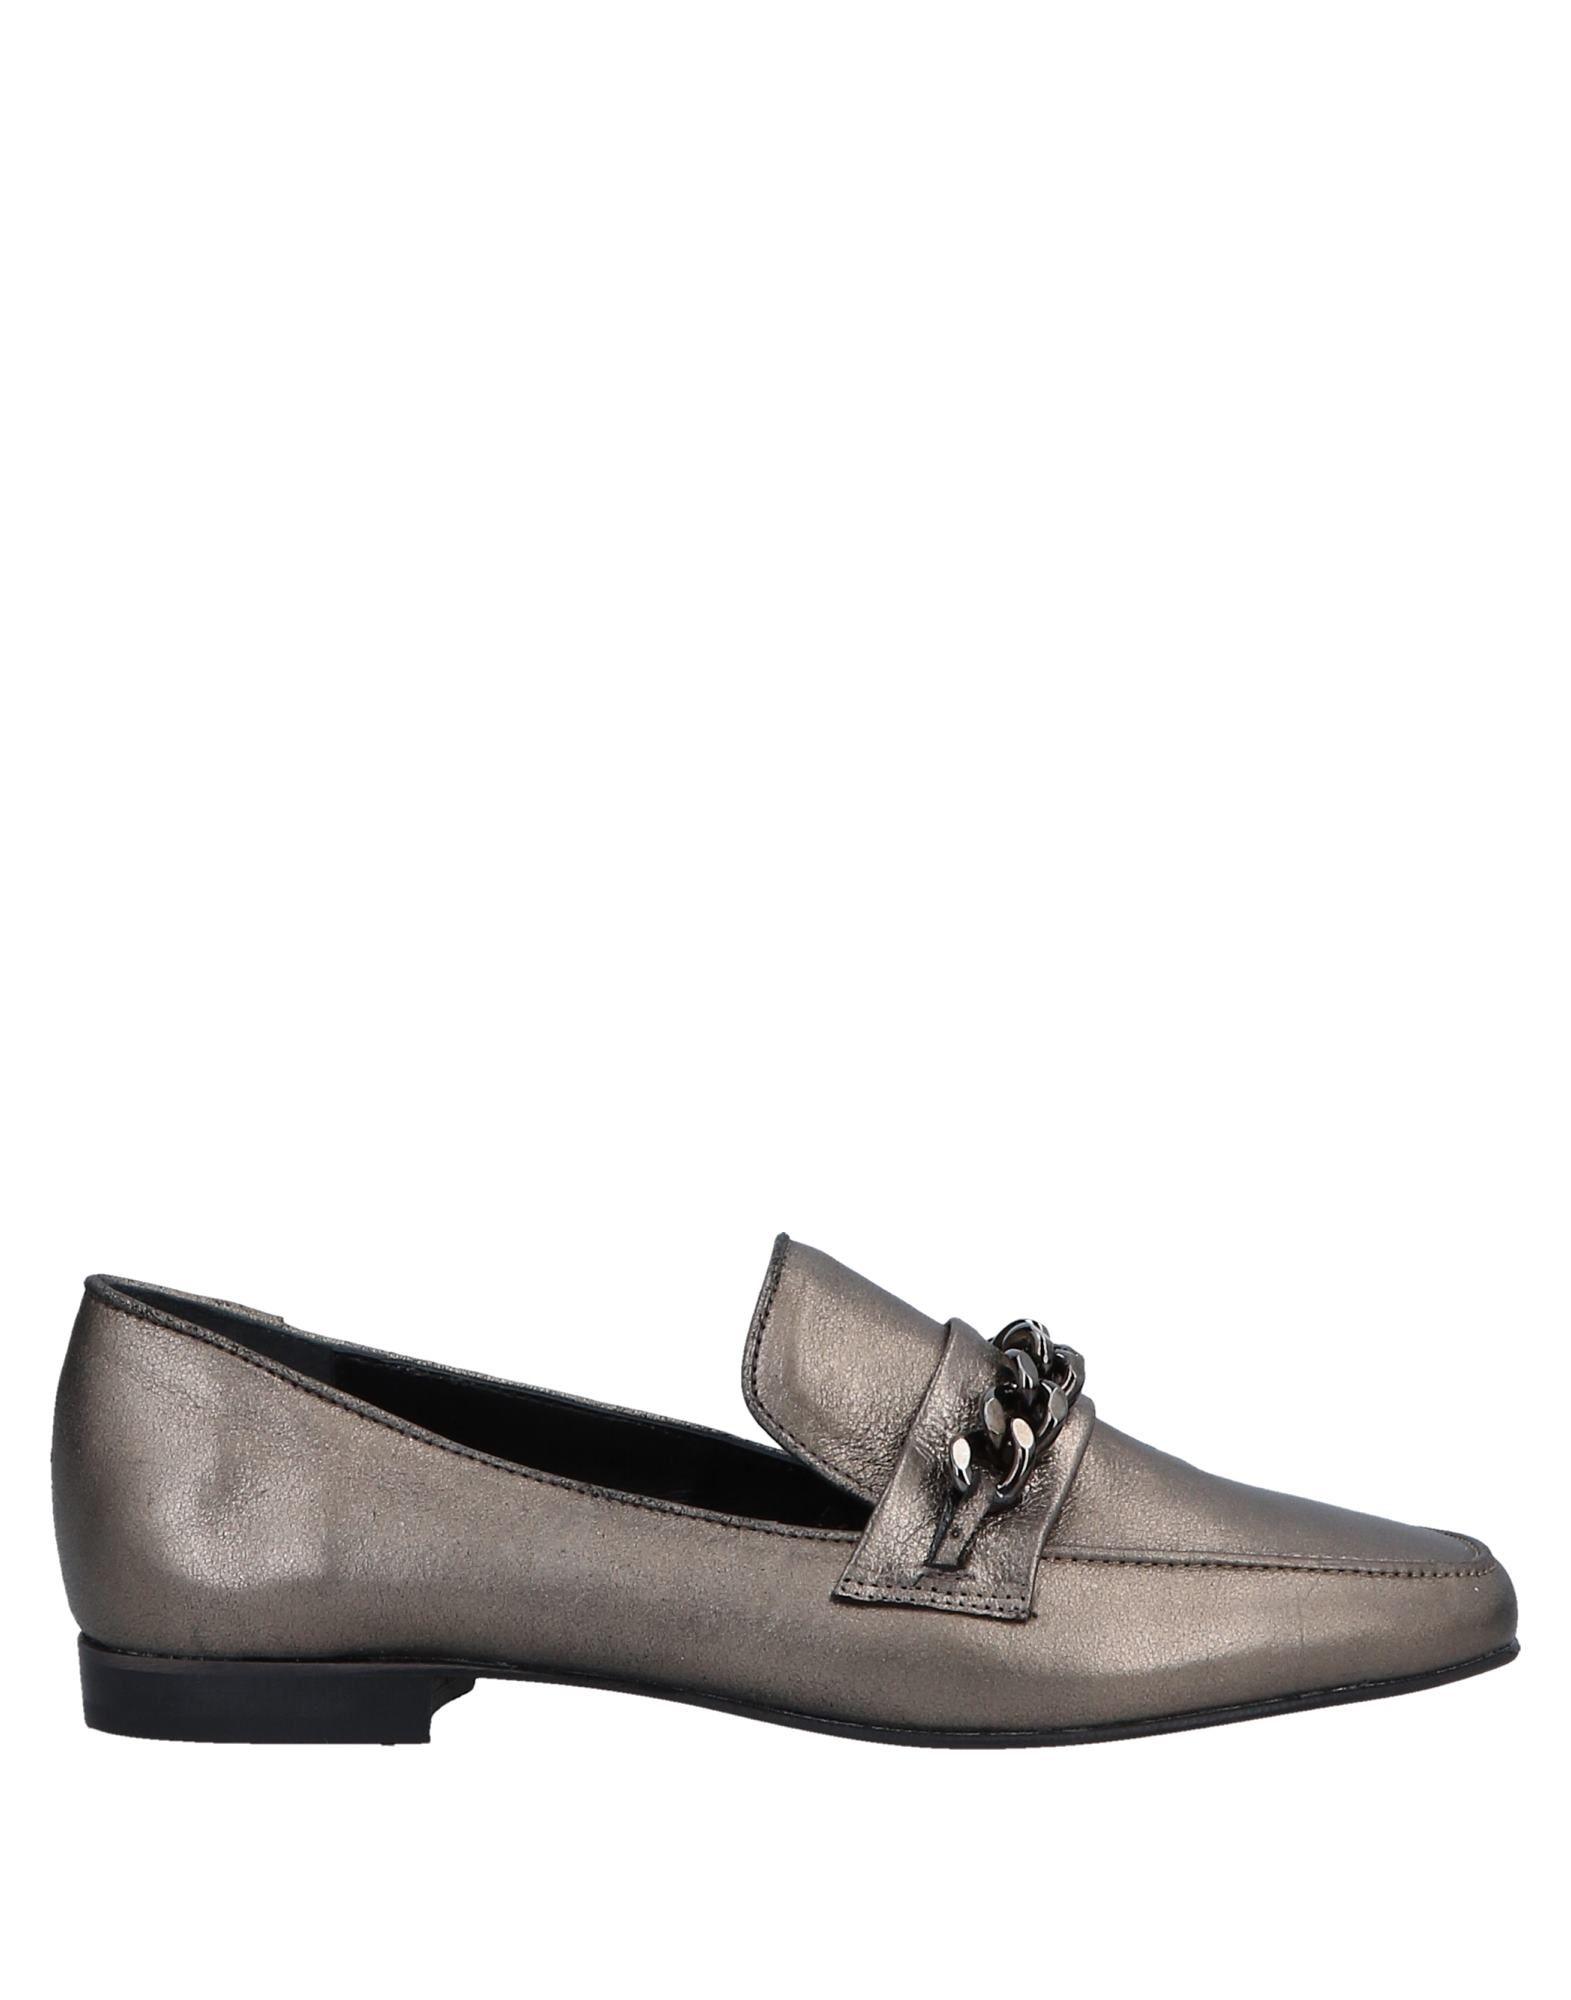 Schuhe Griff Damen Billige Mokassins Italia Stilvolle MpVSzU